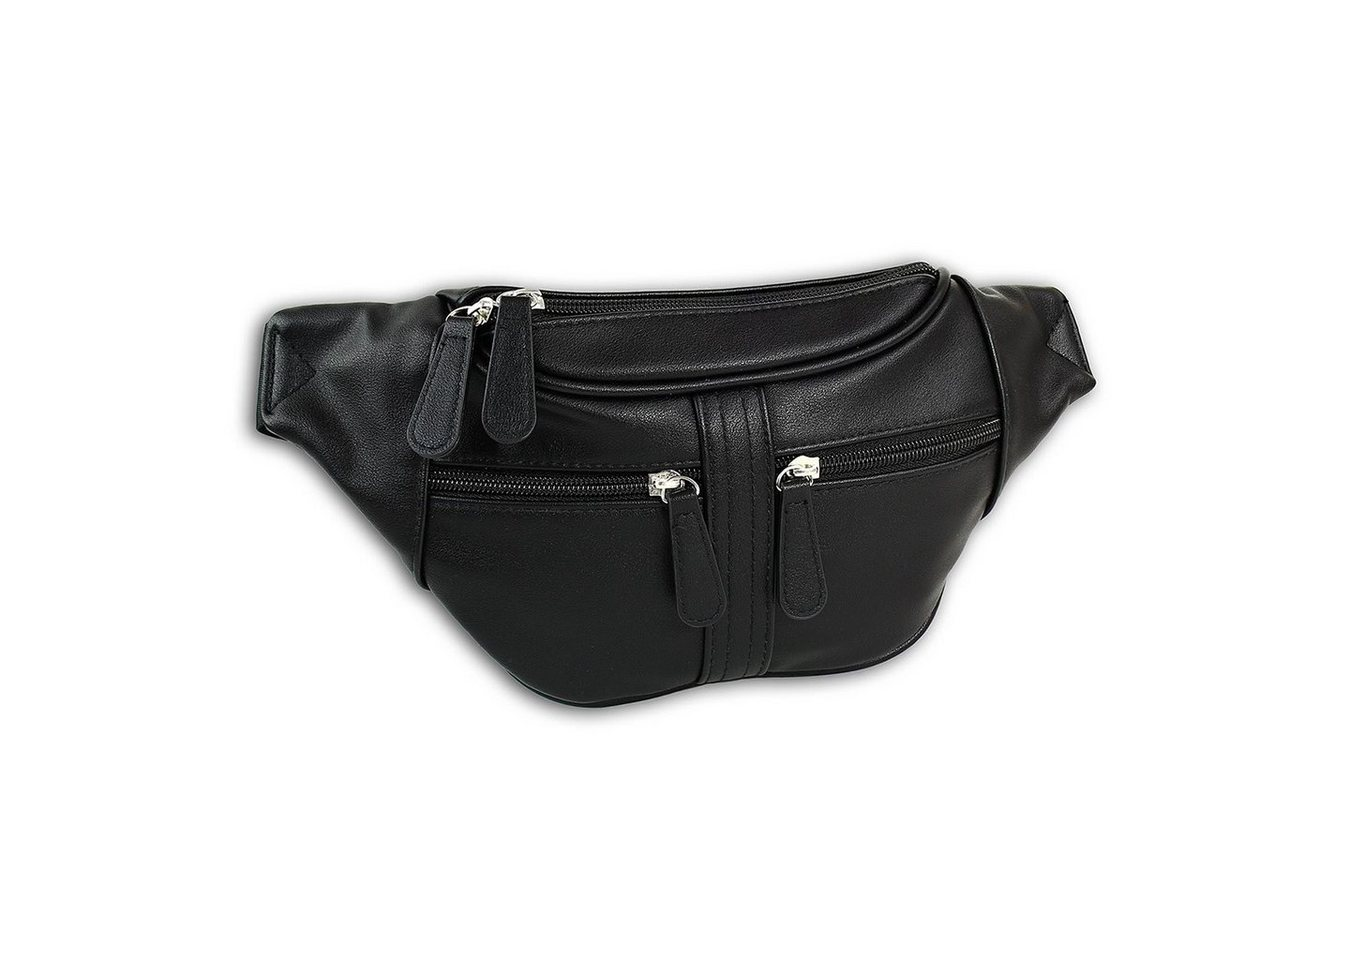 new bags -  Gürteltasche »OTD5023X  Damen Hüfttasche Gürteltasche« (Gürteltasche), Damen, Jugend Tasche schwarz, ca. 35cm x ca. 5cm